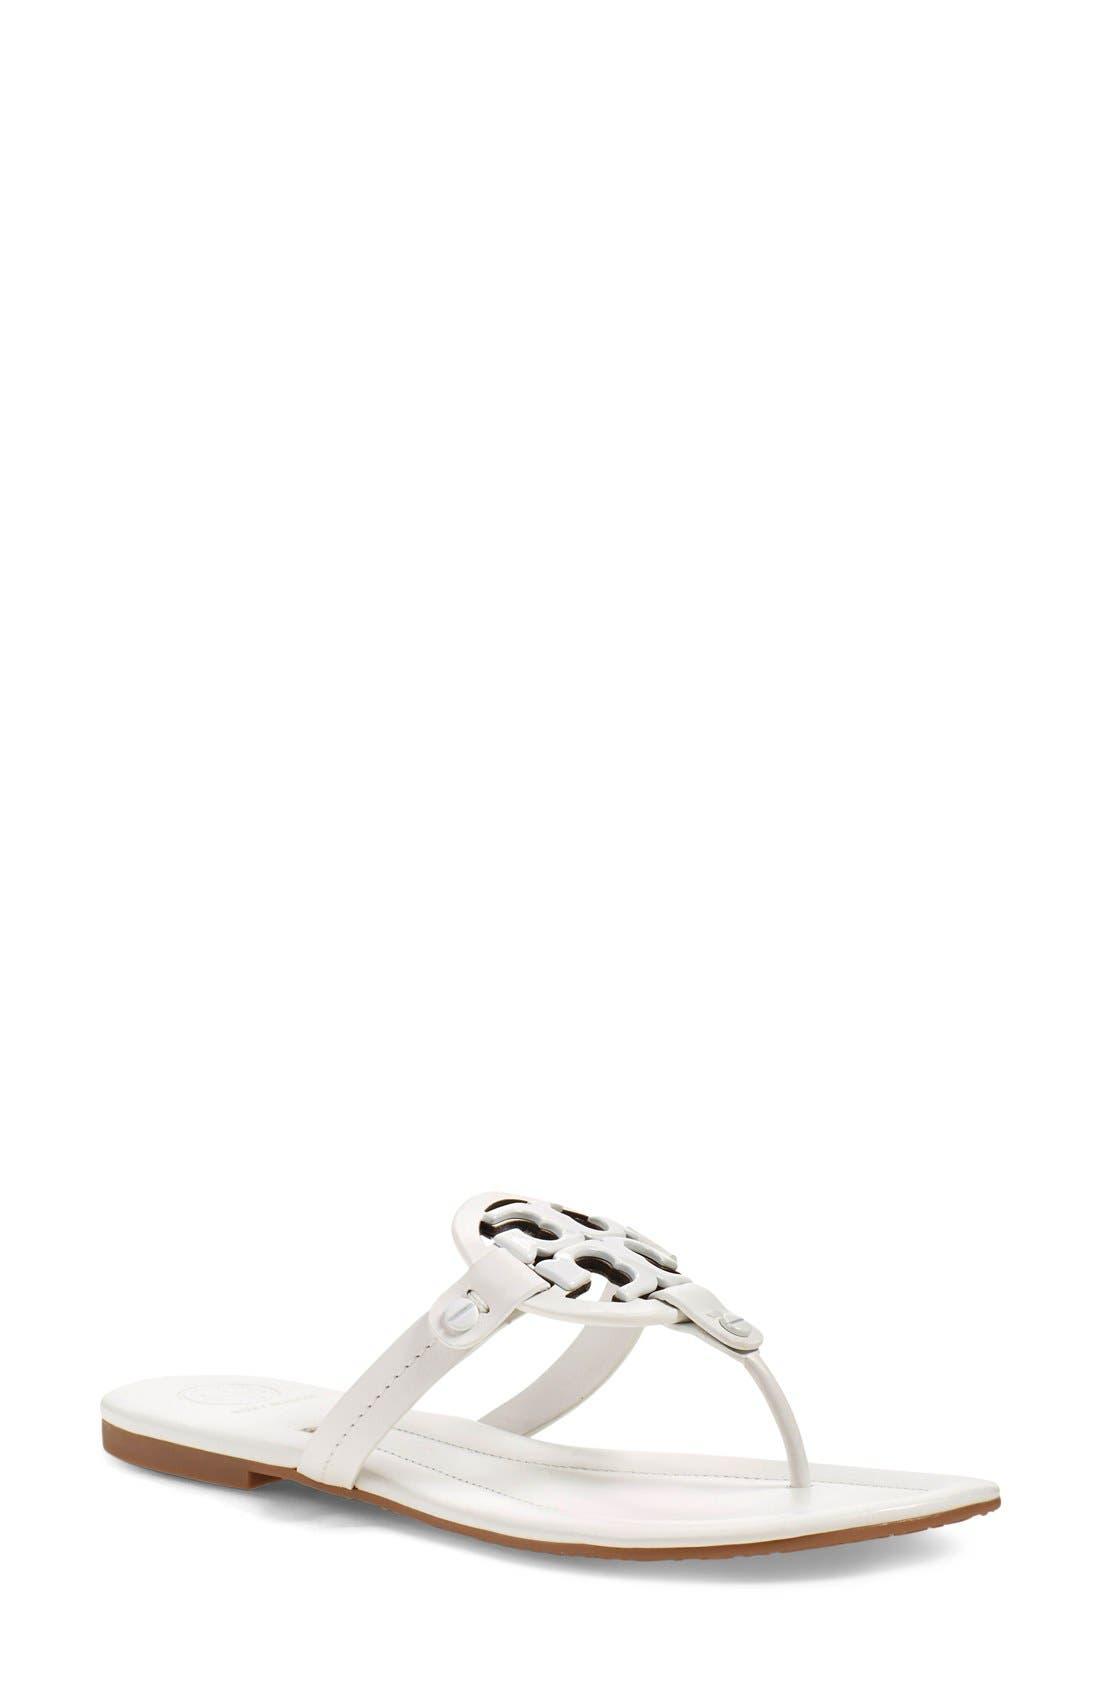 Main Image - Tory Burch 'Miller 2' Logo Sandal (Women)